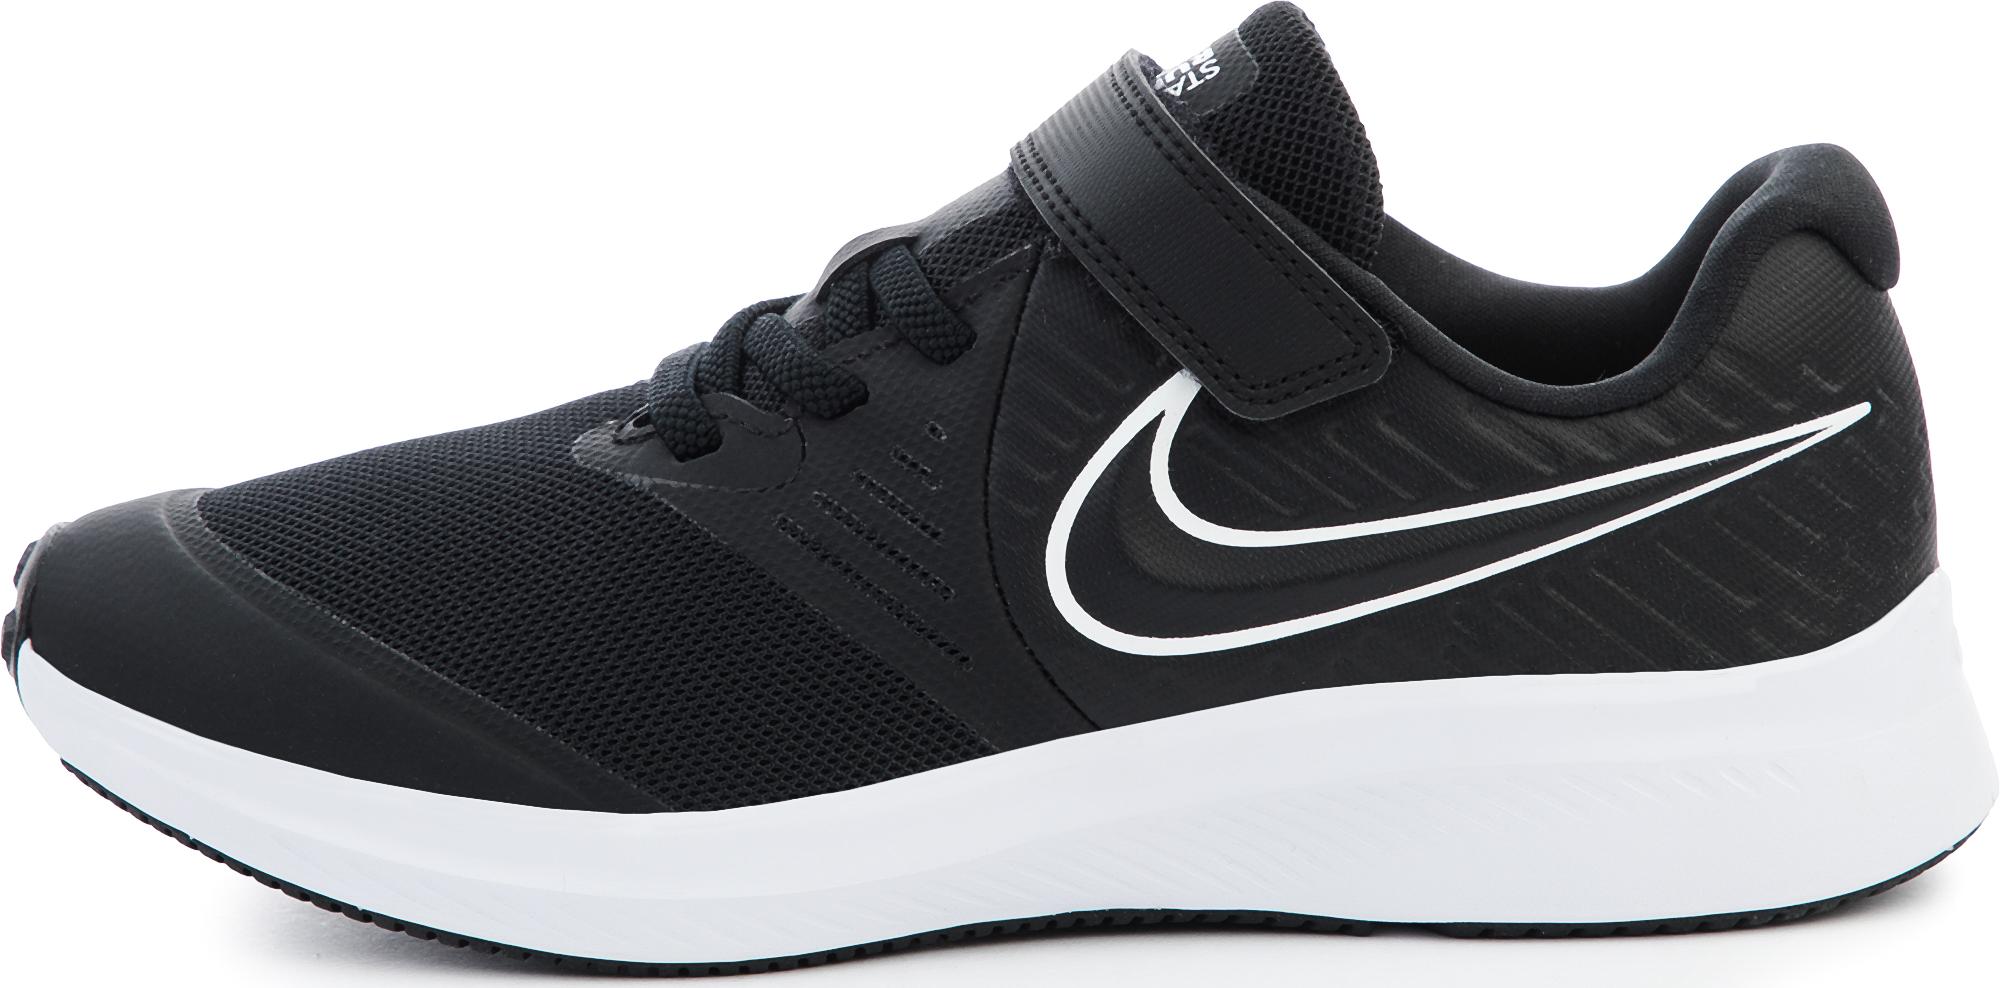 Nike Кроссовки детские Nike Star Runner 2 (Psv), размер 32,5 цена